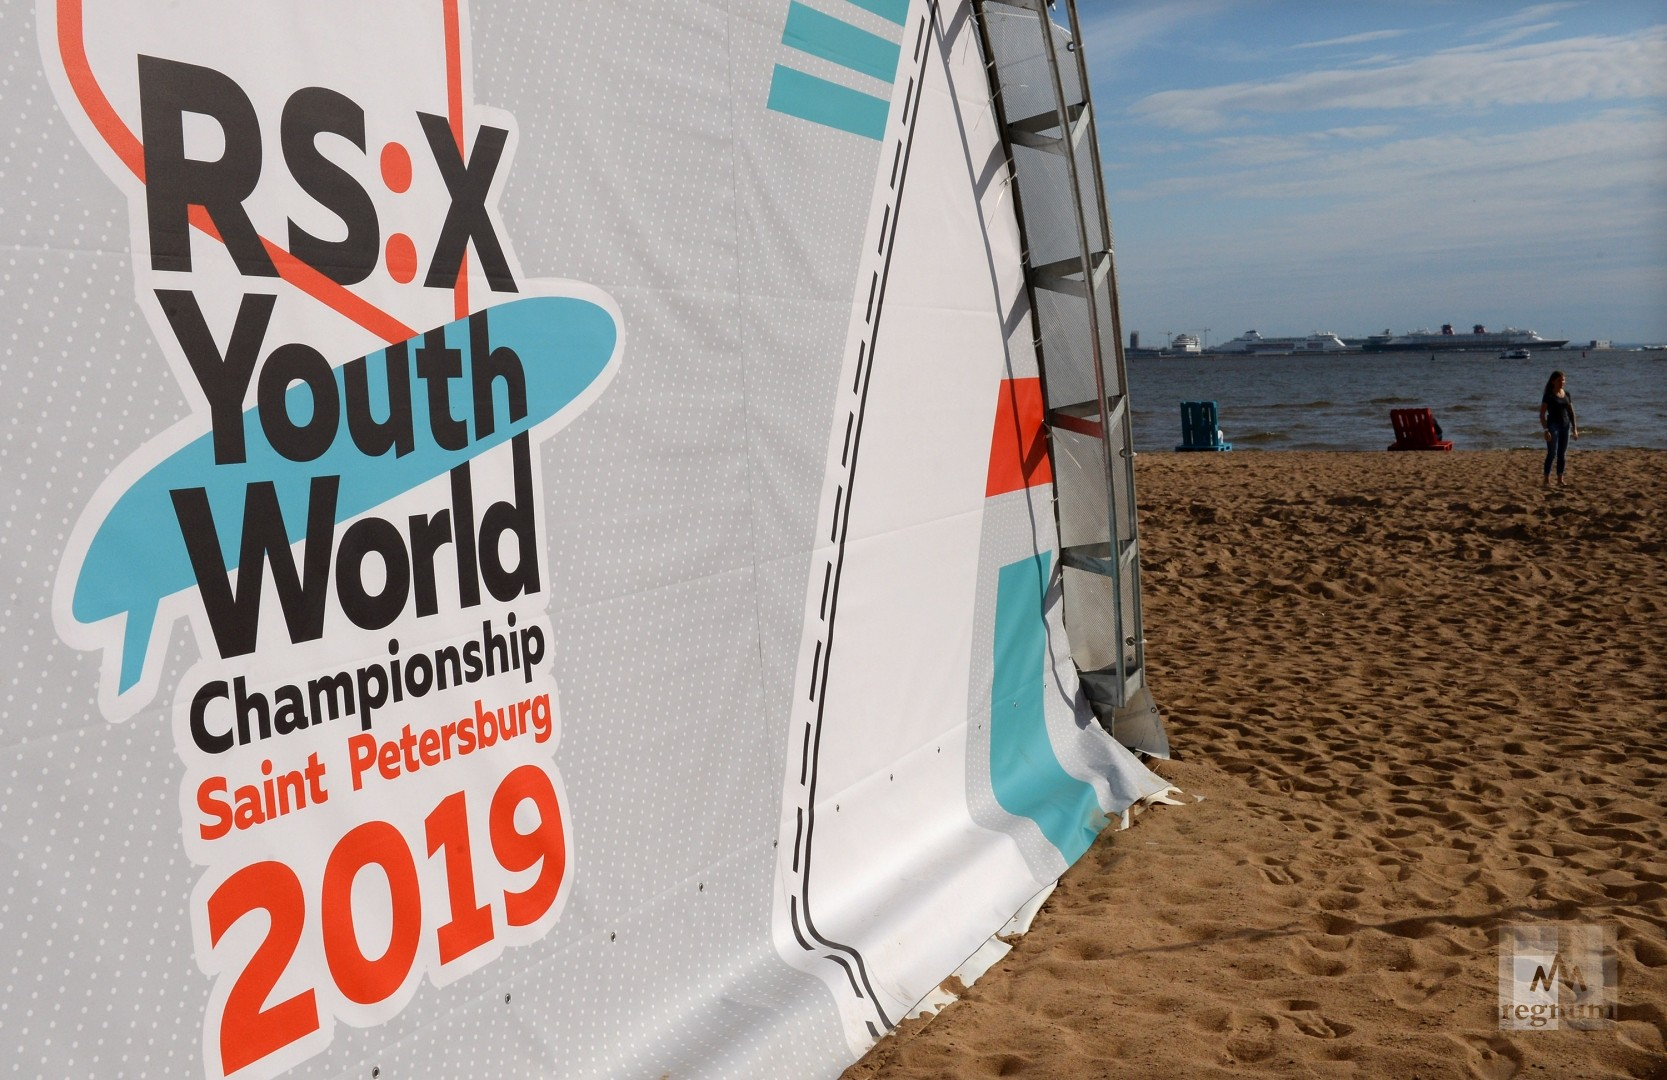 Чемпионат мира по виндсерфингу среди юниоров